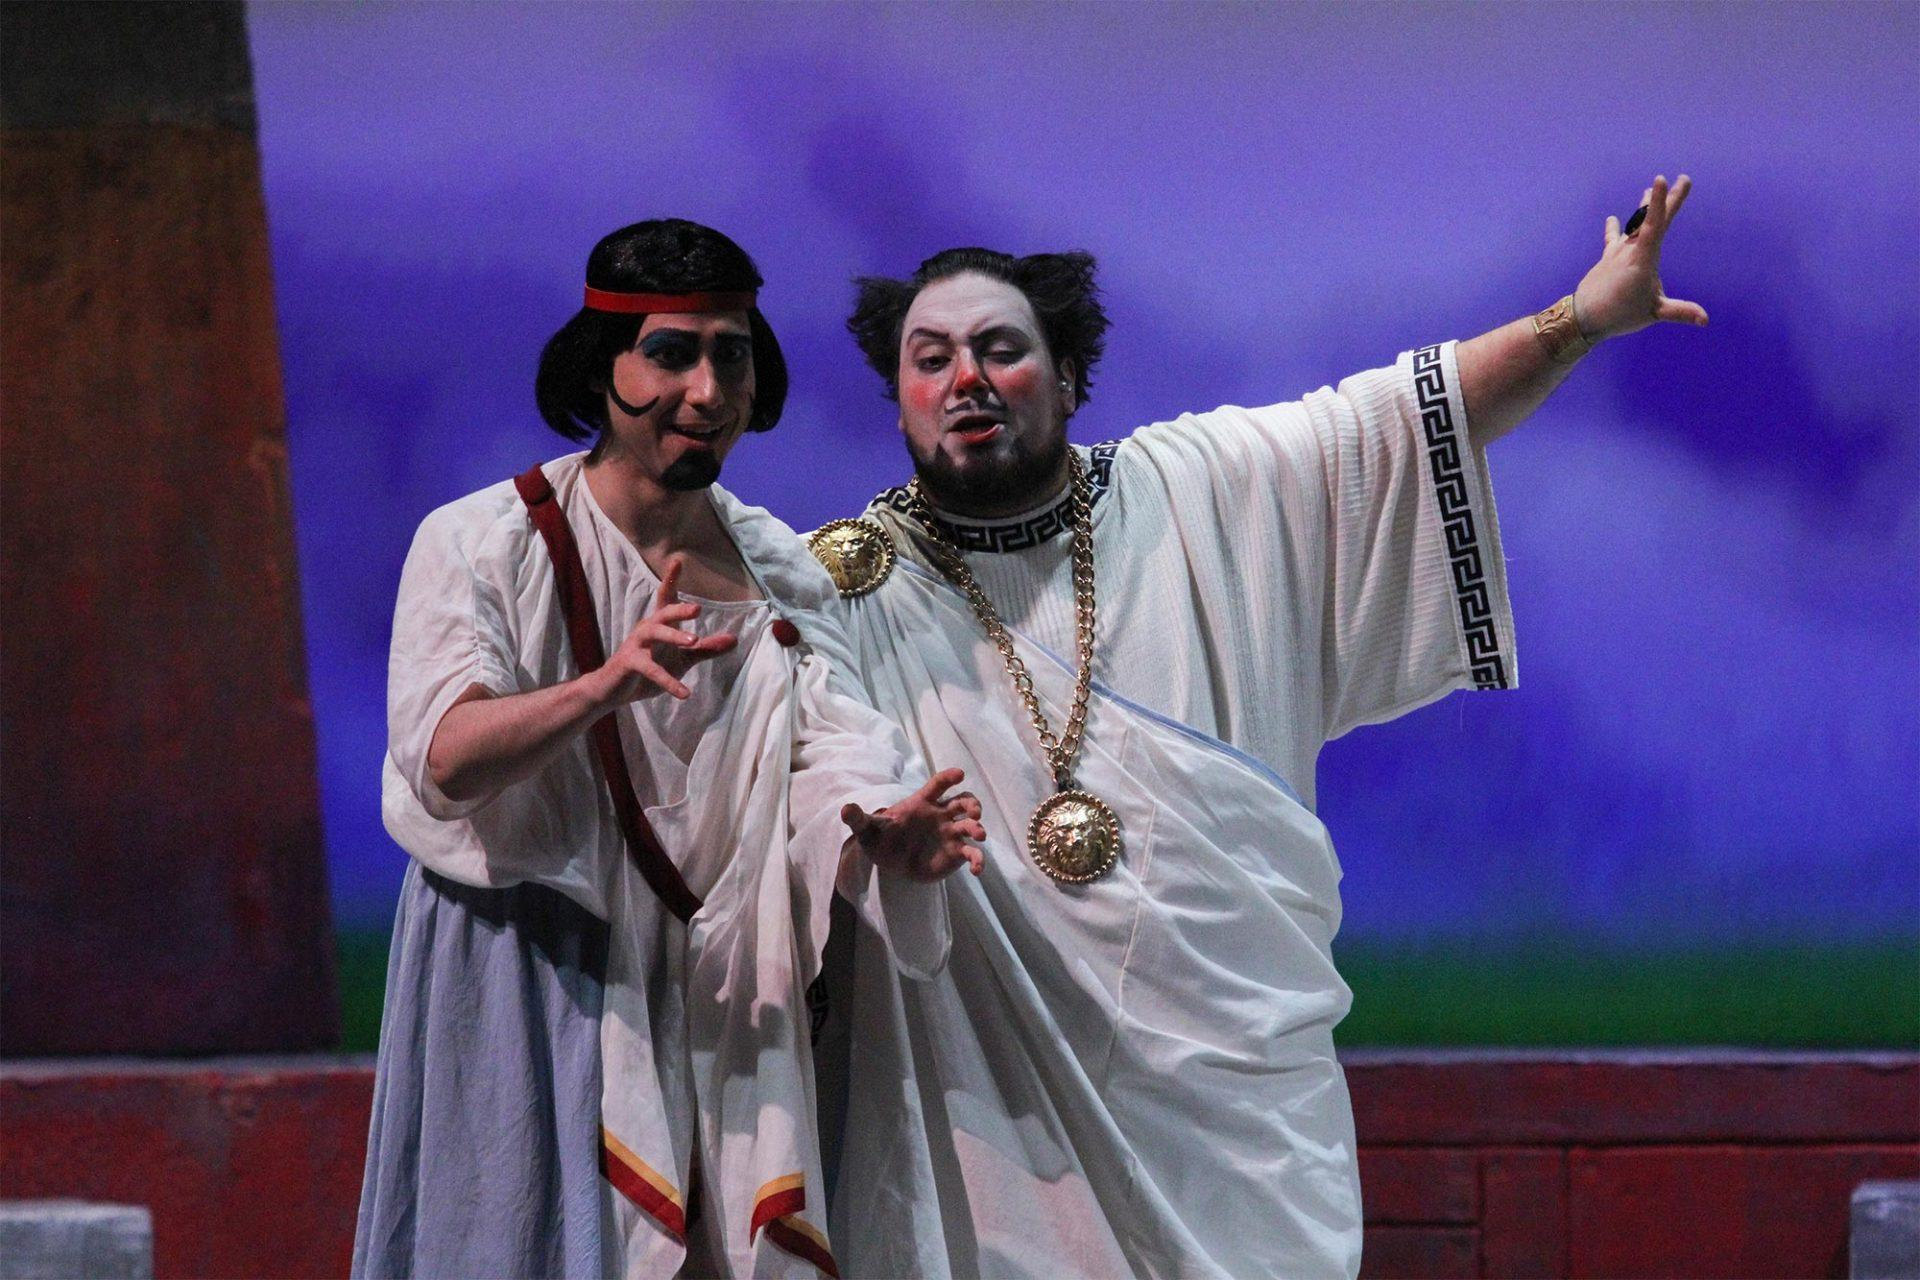 teatro-marrucino-giove-a-pompei-07